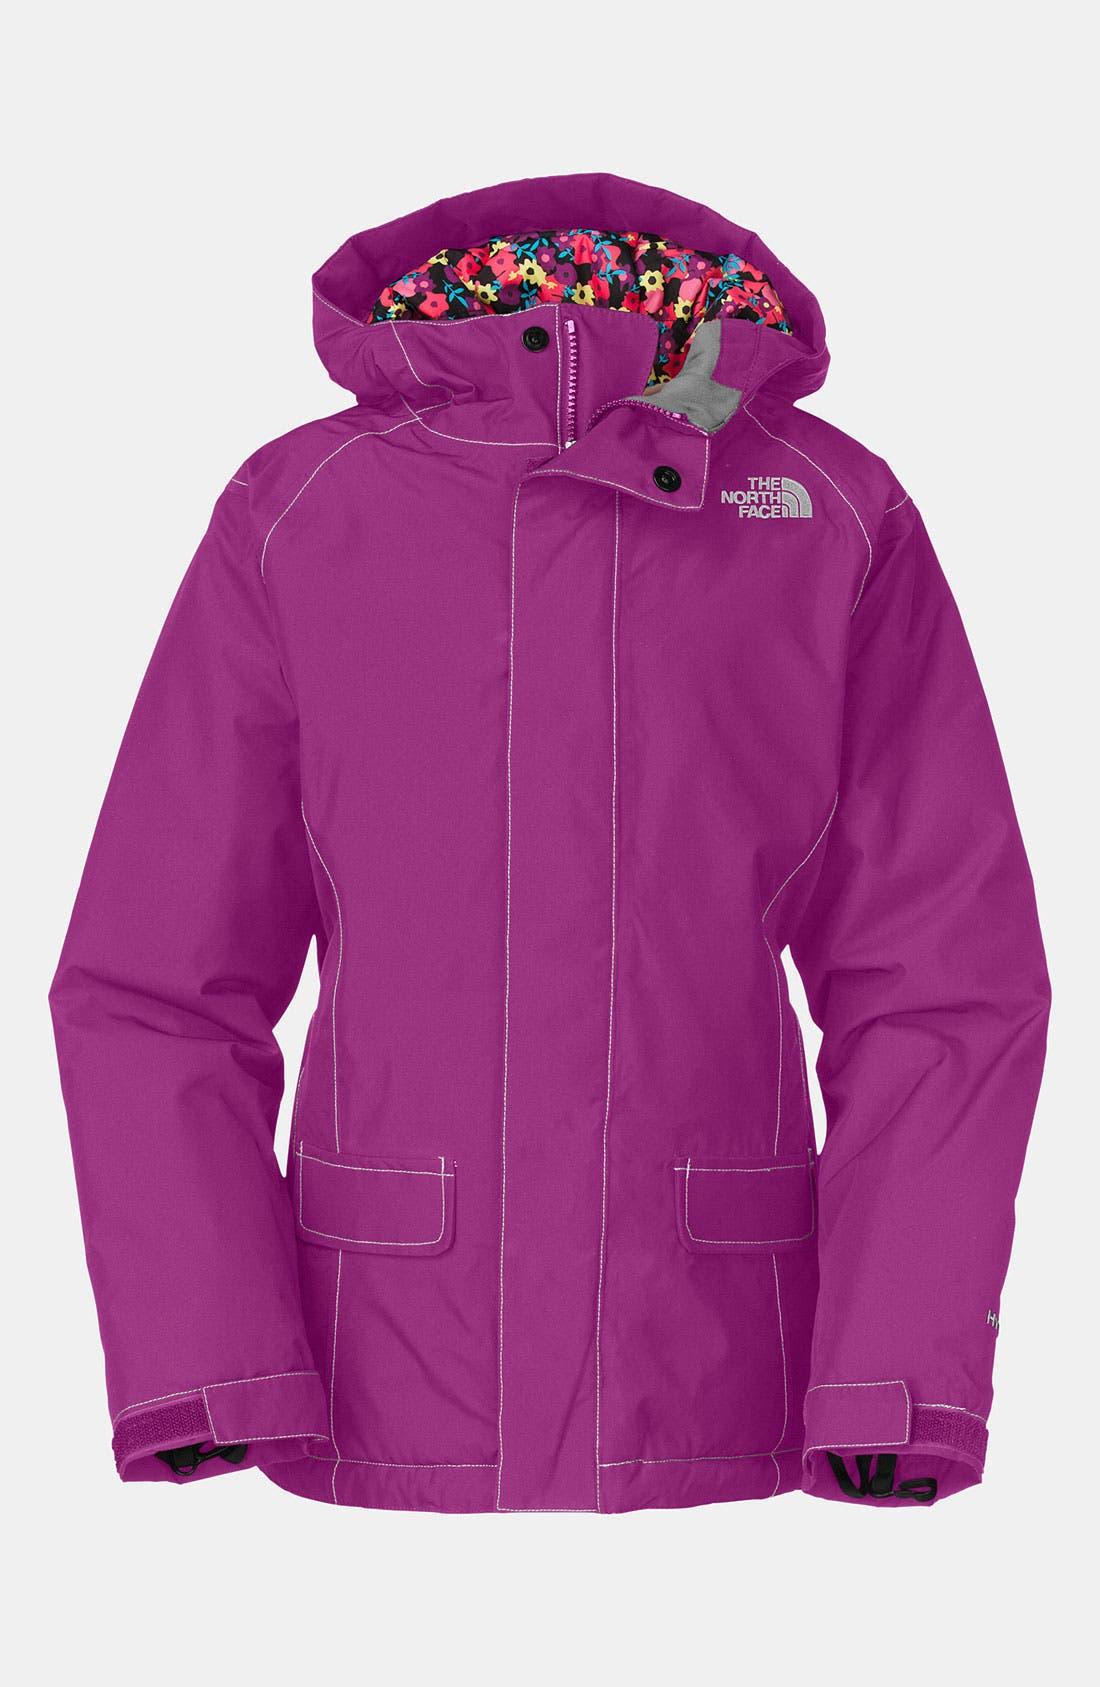 Main Image - The North Face 'Cameele' Jacket (Big Girls)